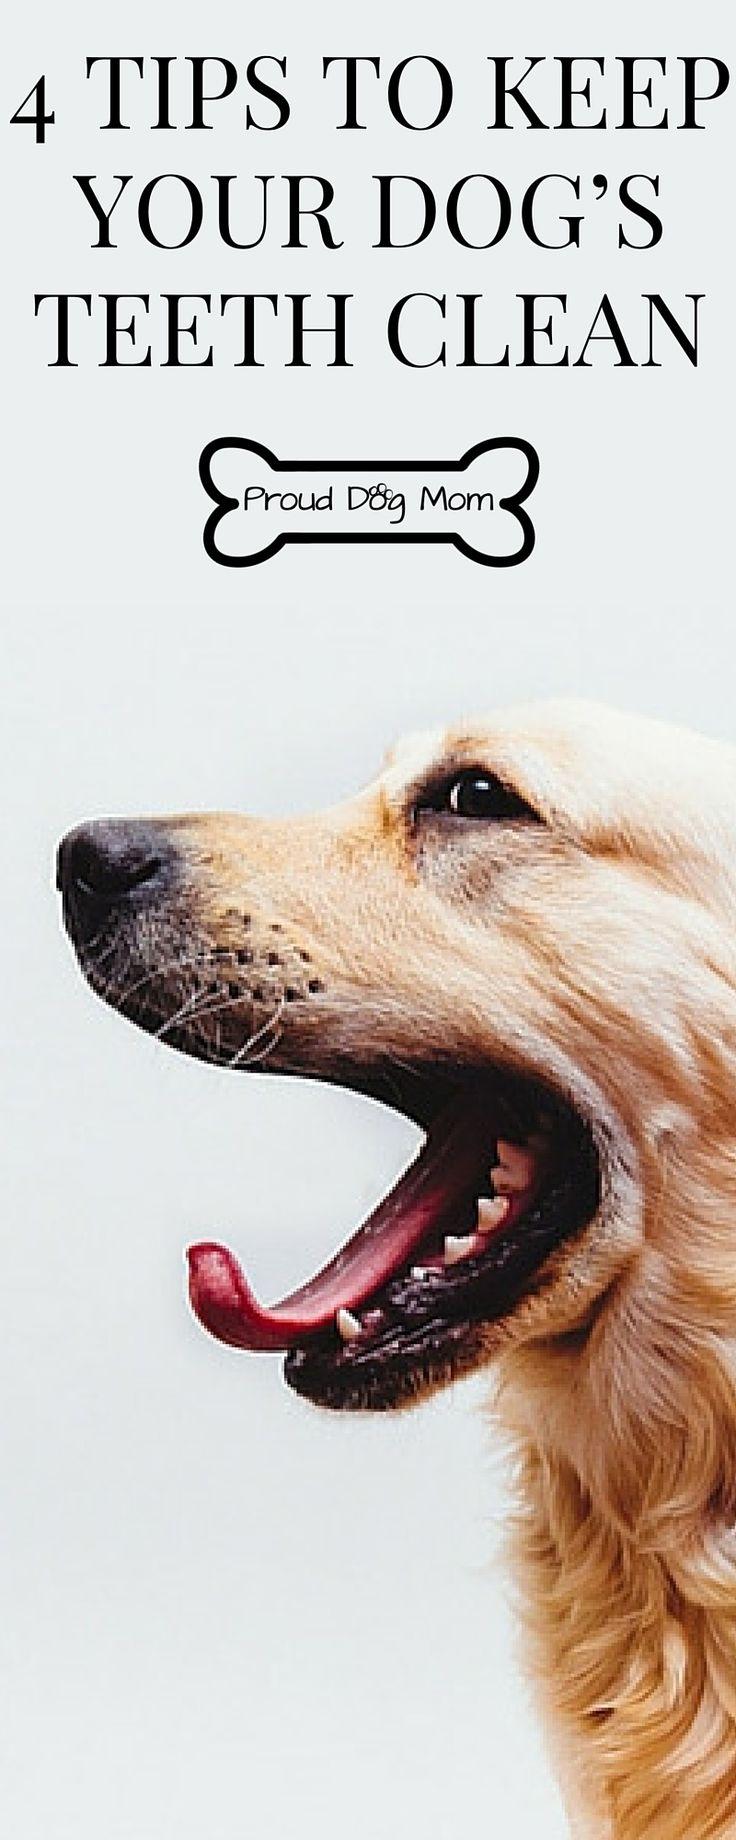 4 Tips To Keep Your Dog's Teeth Clean   Dog Health Tips  